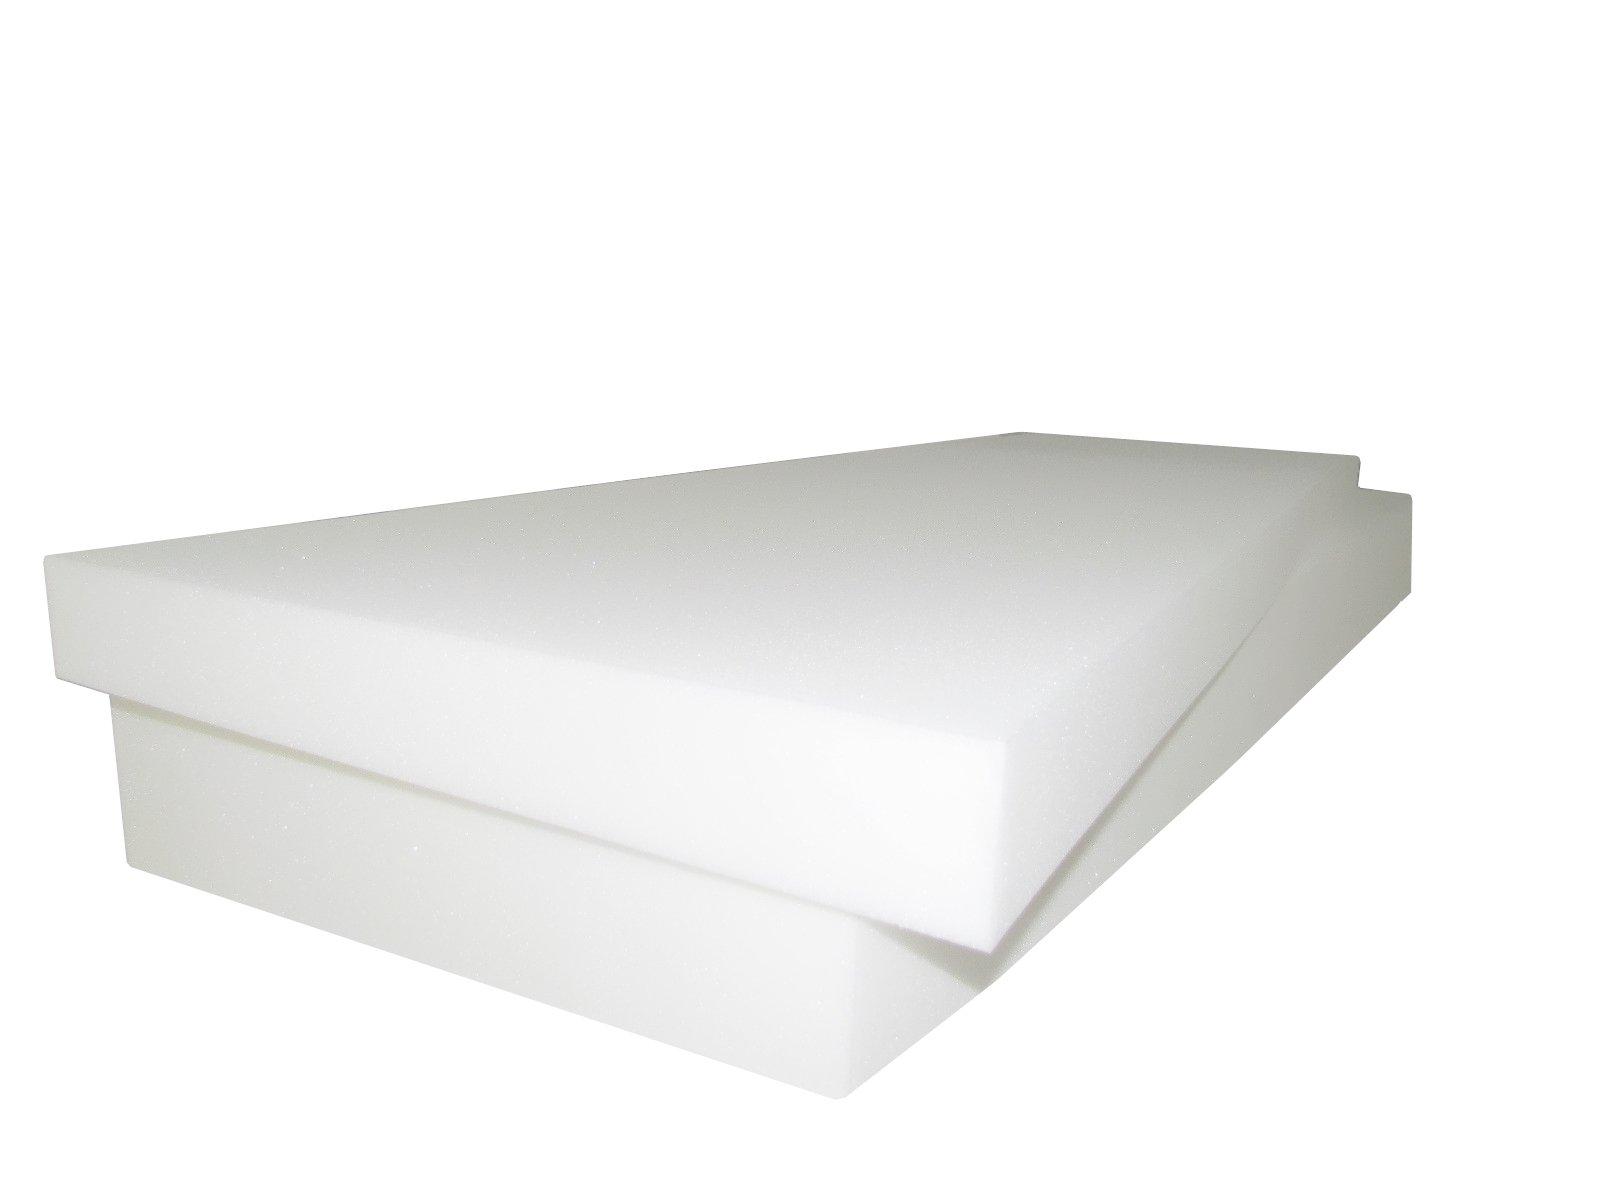 Foam Cushion 4''T x33''W x80''L (1536) ''Medium Firm'' Sofa Seat Replacement Foam Cushion, Upholstery Foam Sheet, Foam Padding by Isellfoam